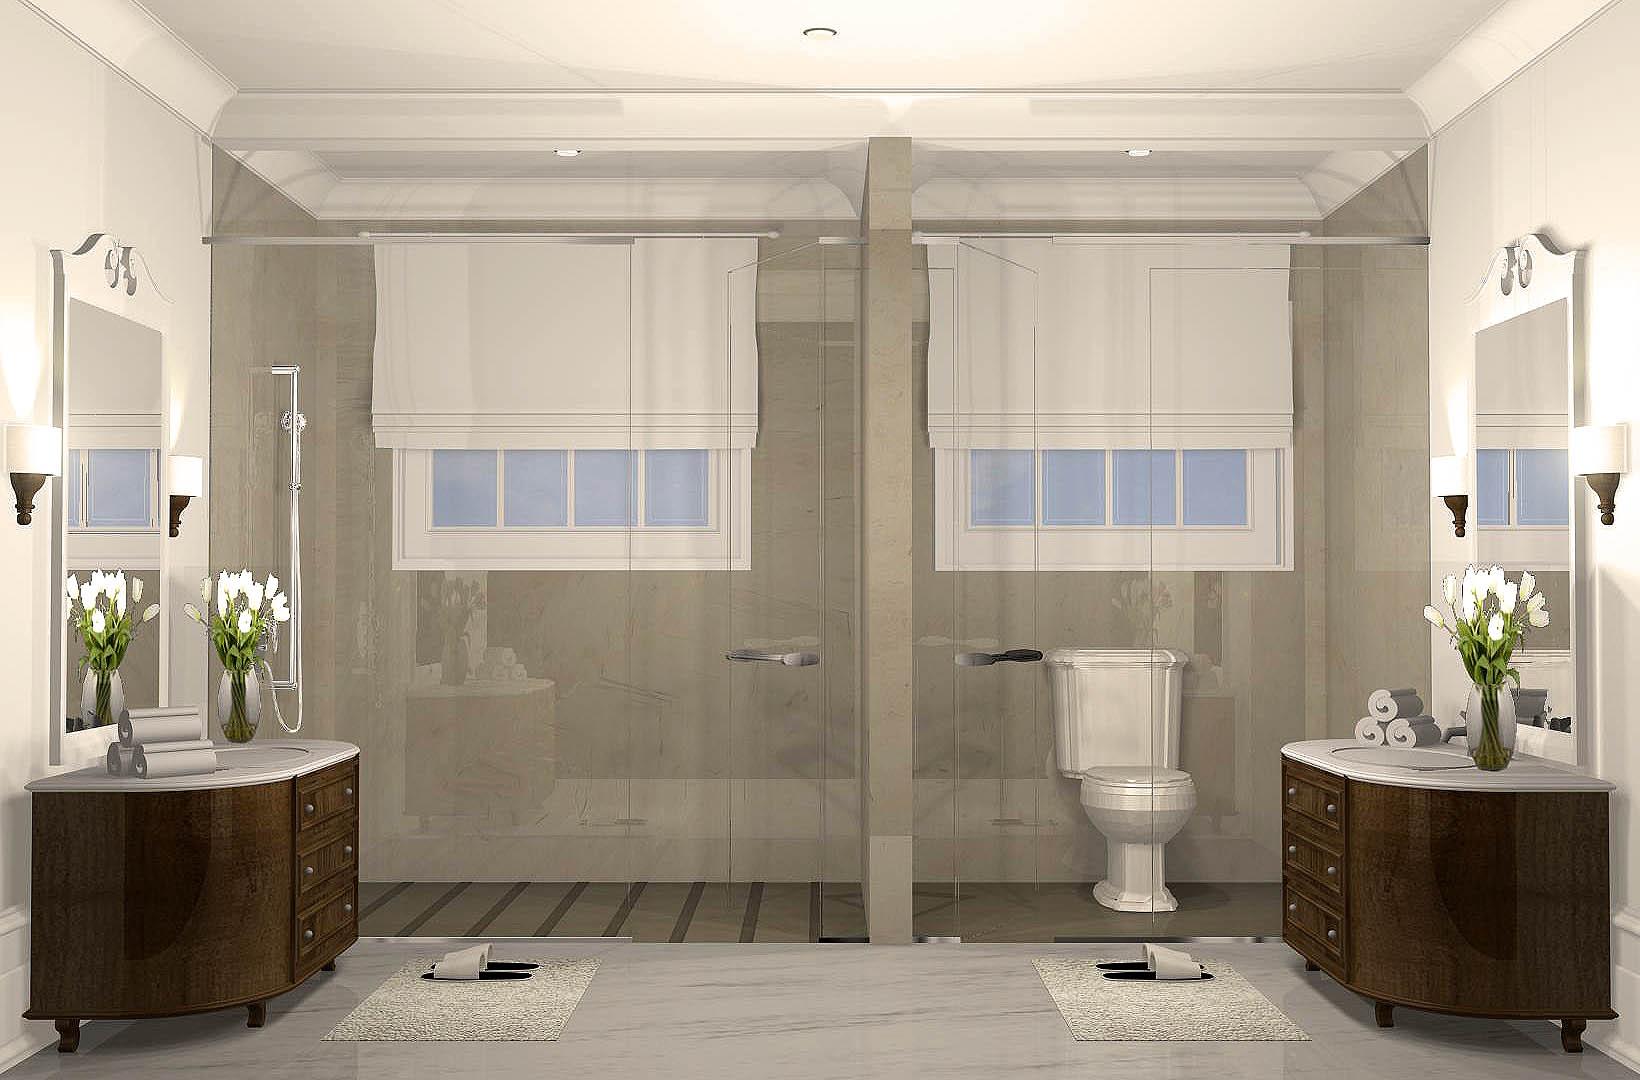 Desain interior kamar mandi anak laki - laki minimalis, jasa desain interior ruang tamu, ruang tamu gaya minimalis klasik, ruang tamu mewah, ruang tamu bergaya minimalis eropa, ruang tamu skandinavian, desain interior rumah minimalis, desain interior rumah minimalis klasik